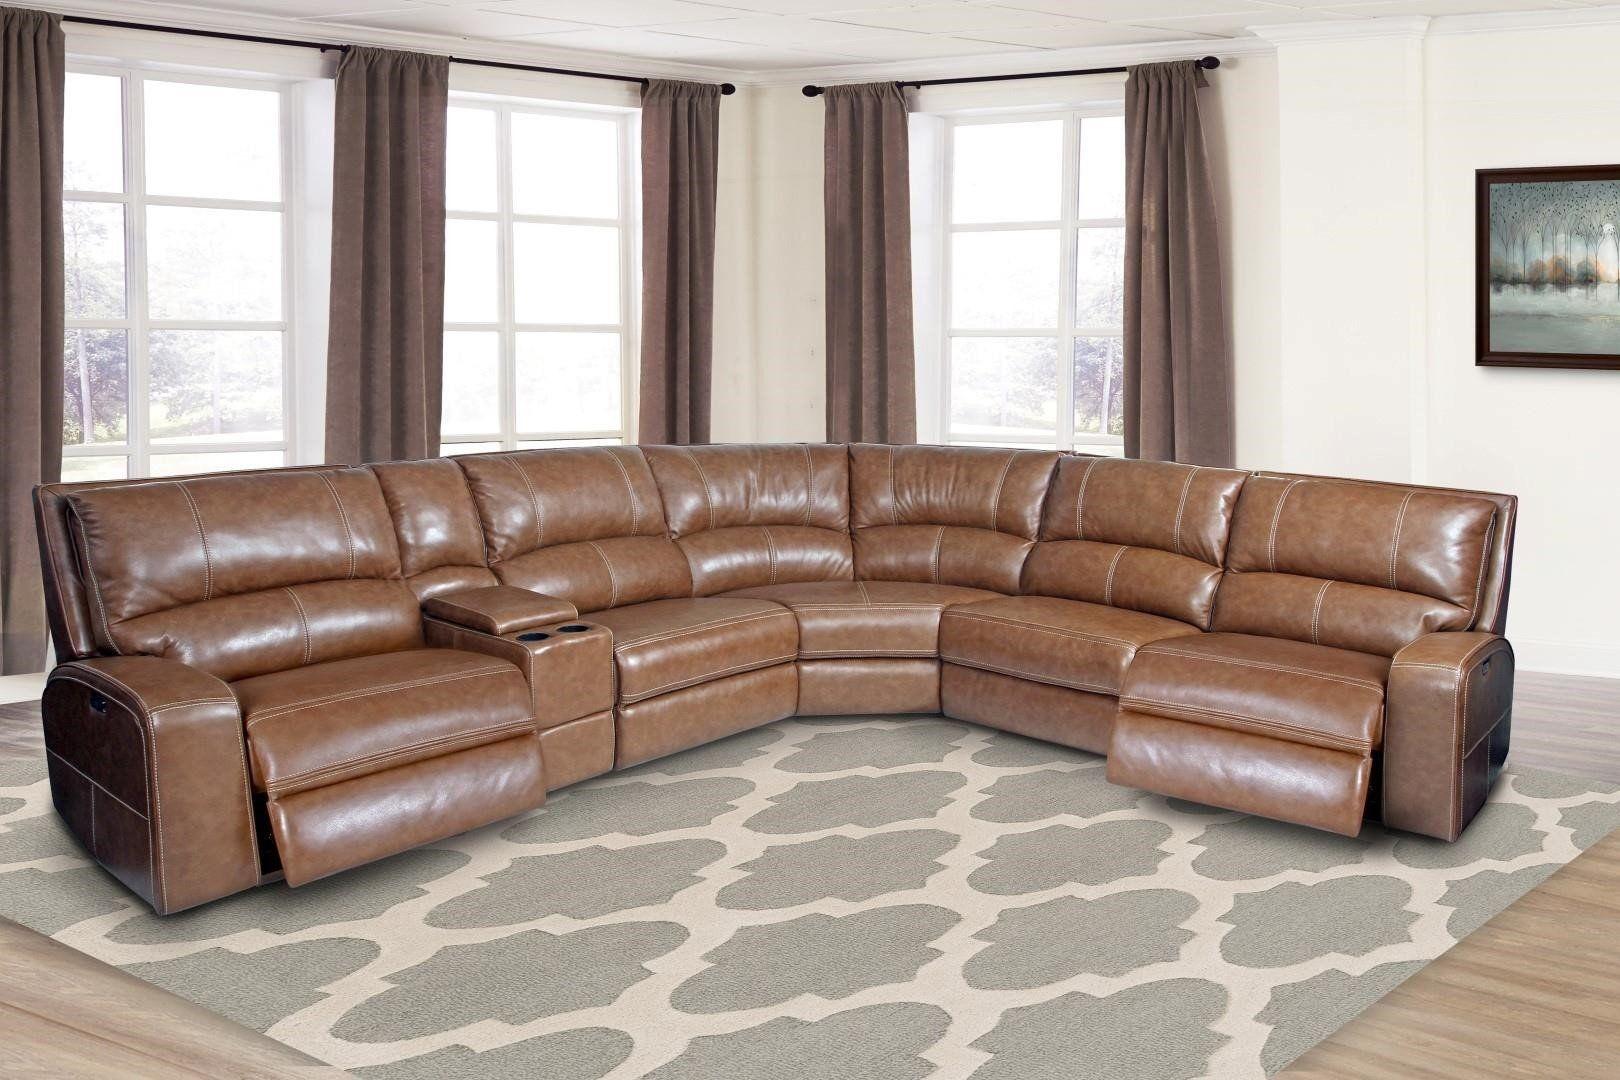 Living Room Wall Decor Sets Beautiful Living Room Furniture El Paso Tx In 2020 Power Reclining Sectional Sofa Reclining Sectional Sectional Sofa With Recliner